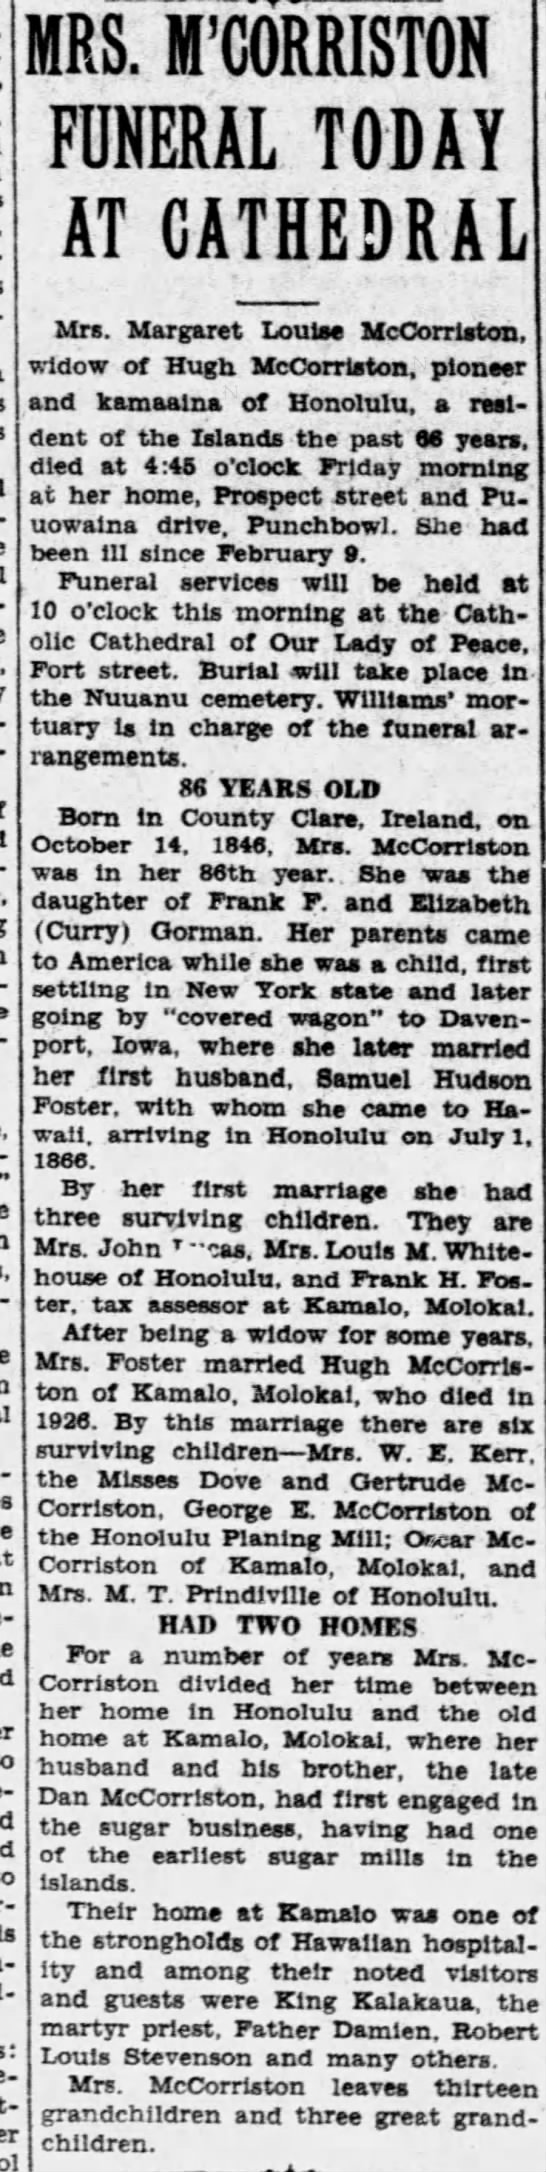 Obituary of Margaret Louise Gorman Foster McCorriston, 1932